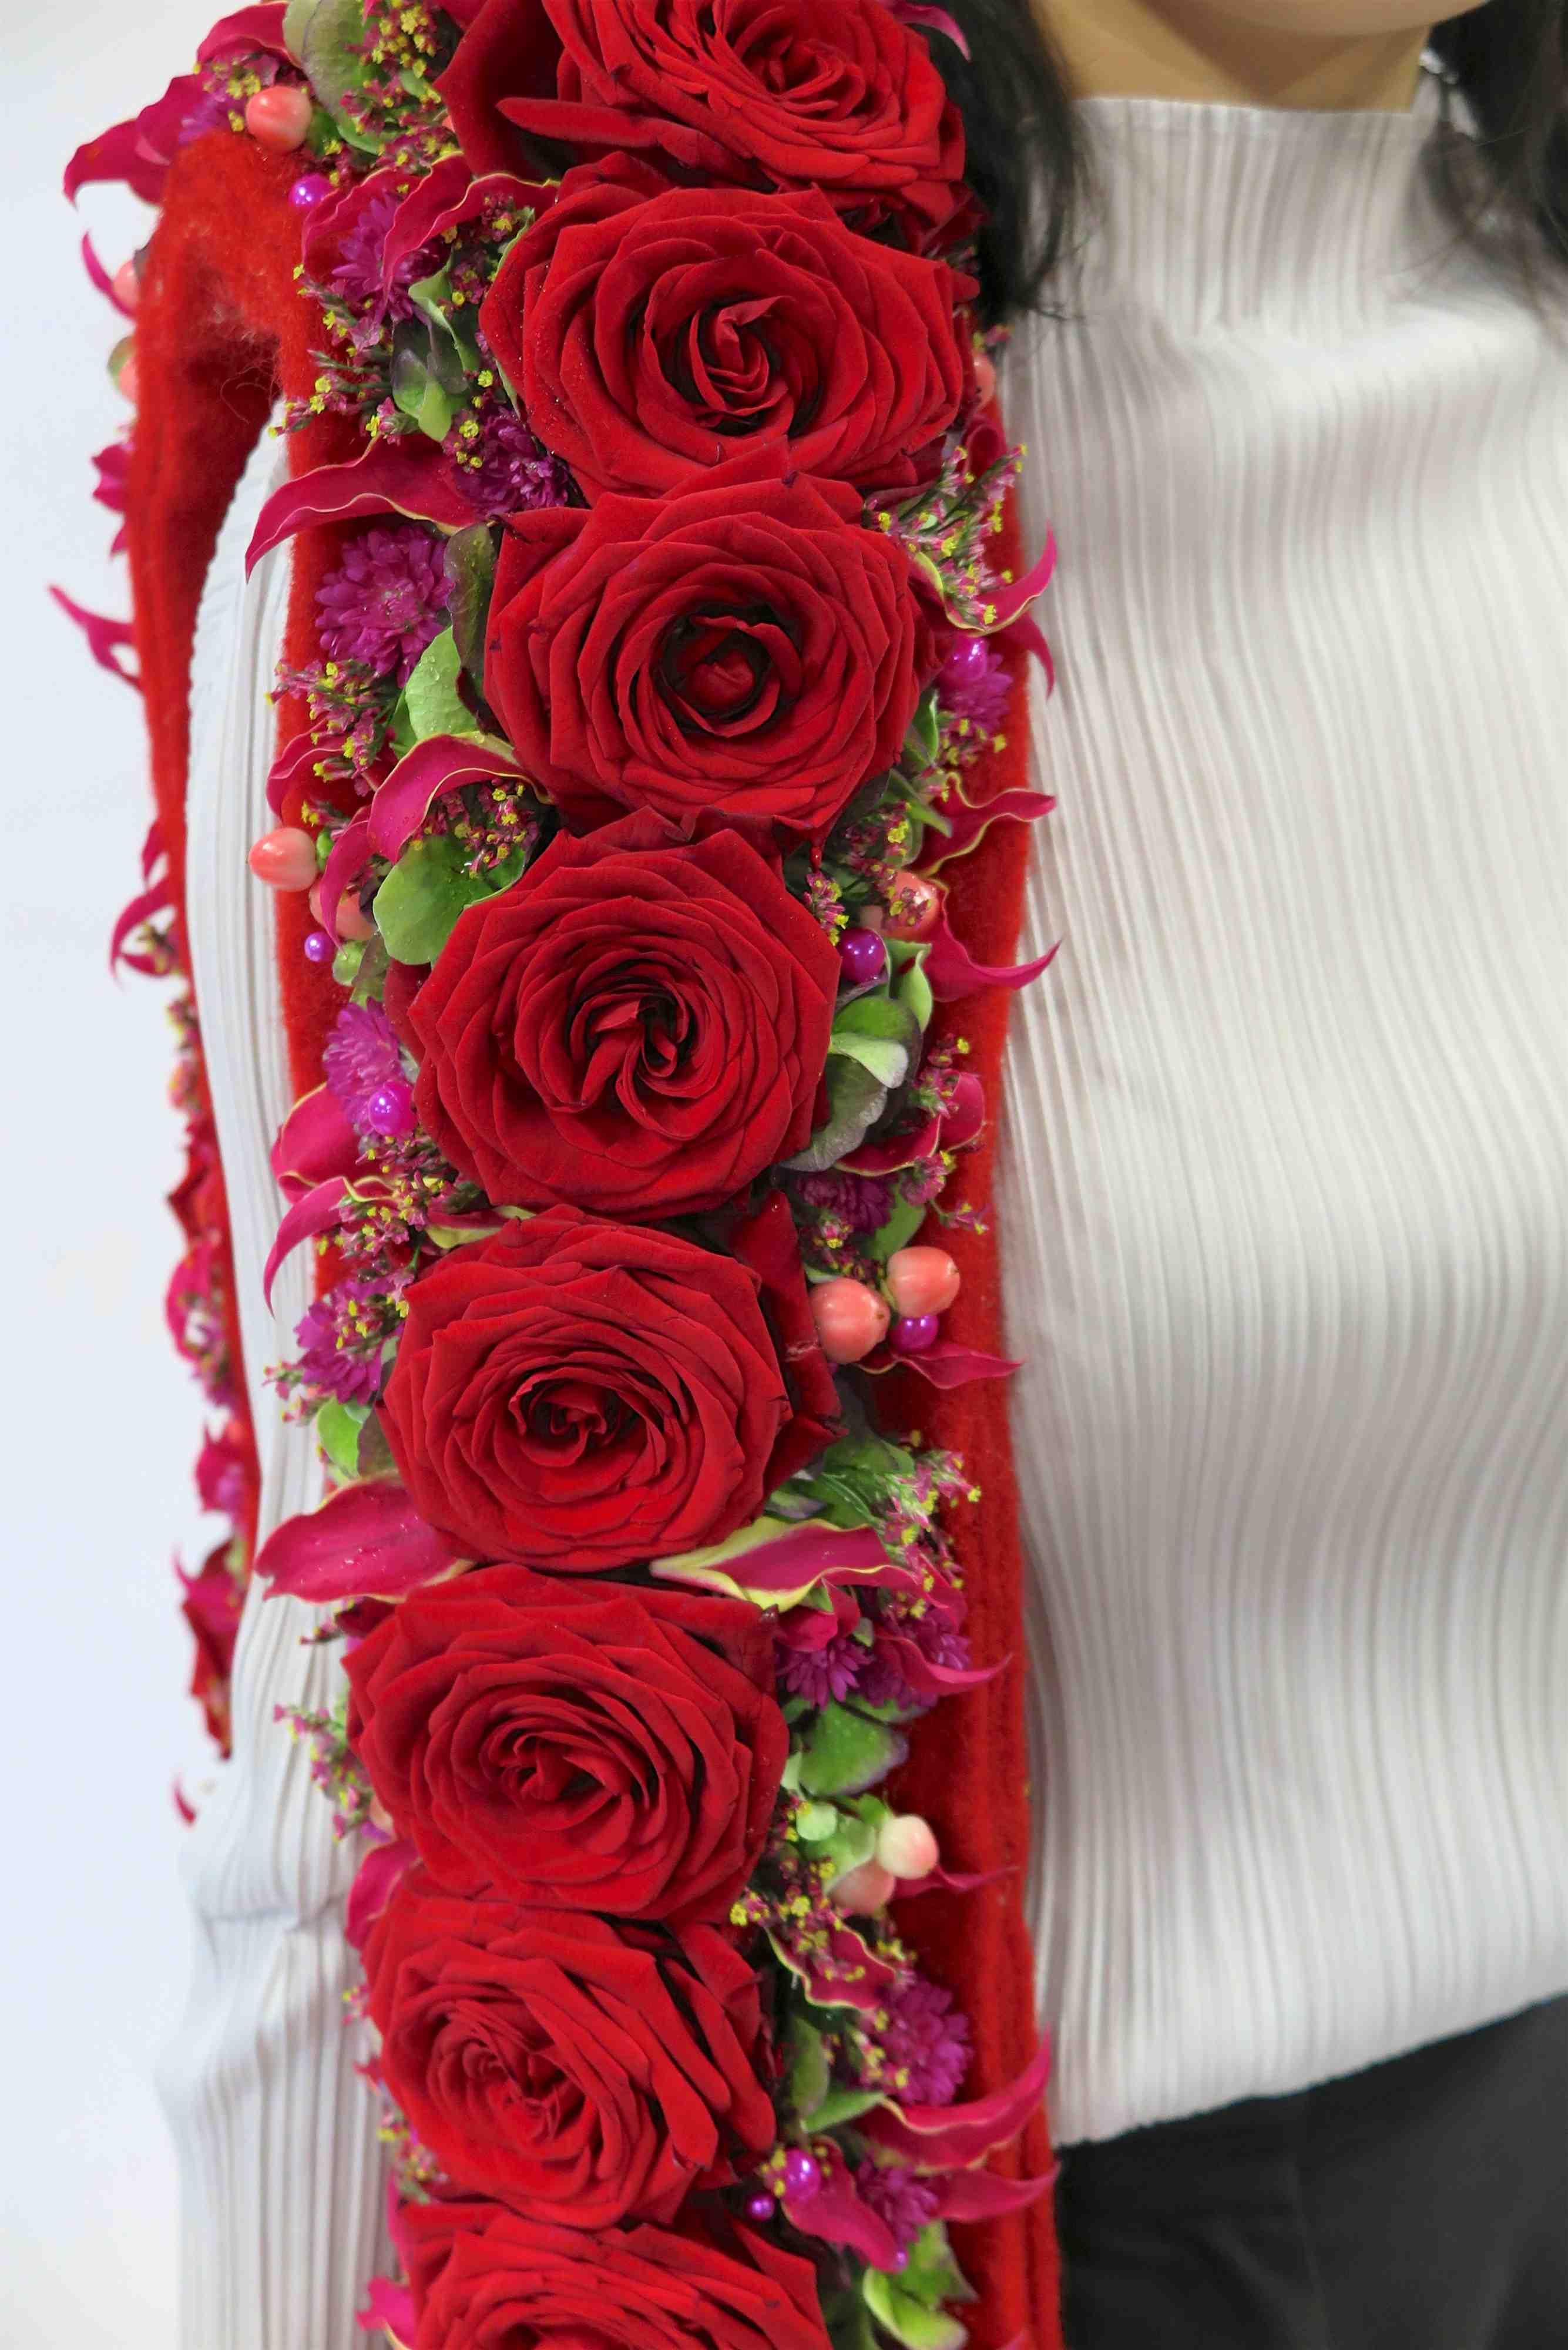 porta nova red naomi alex segura spanish designer valentines day